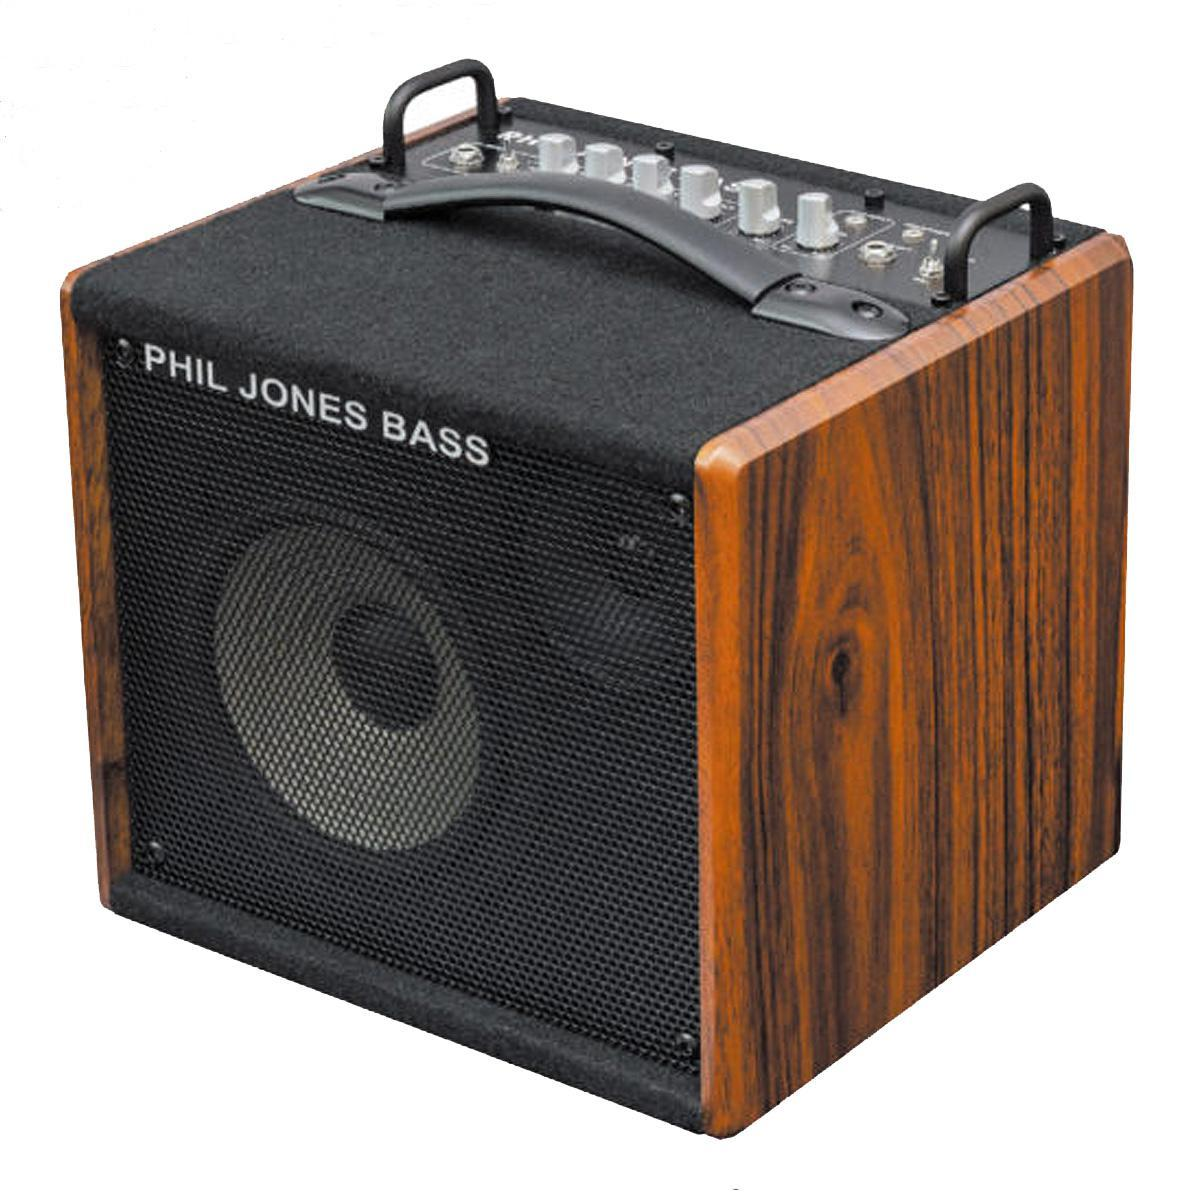 Phil Jones Bass Micro7 Walnat